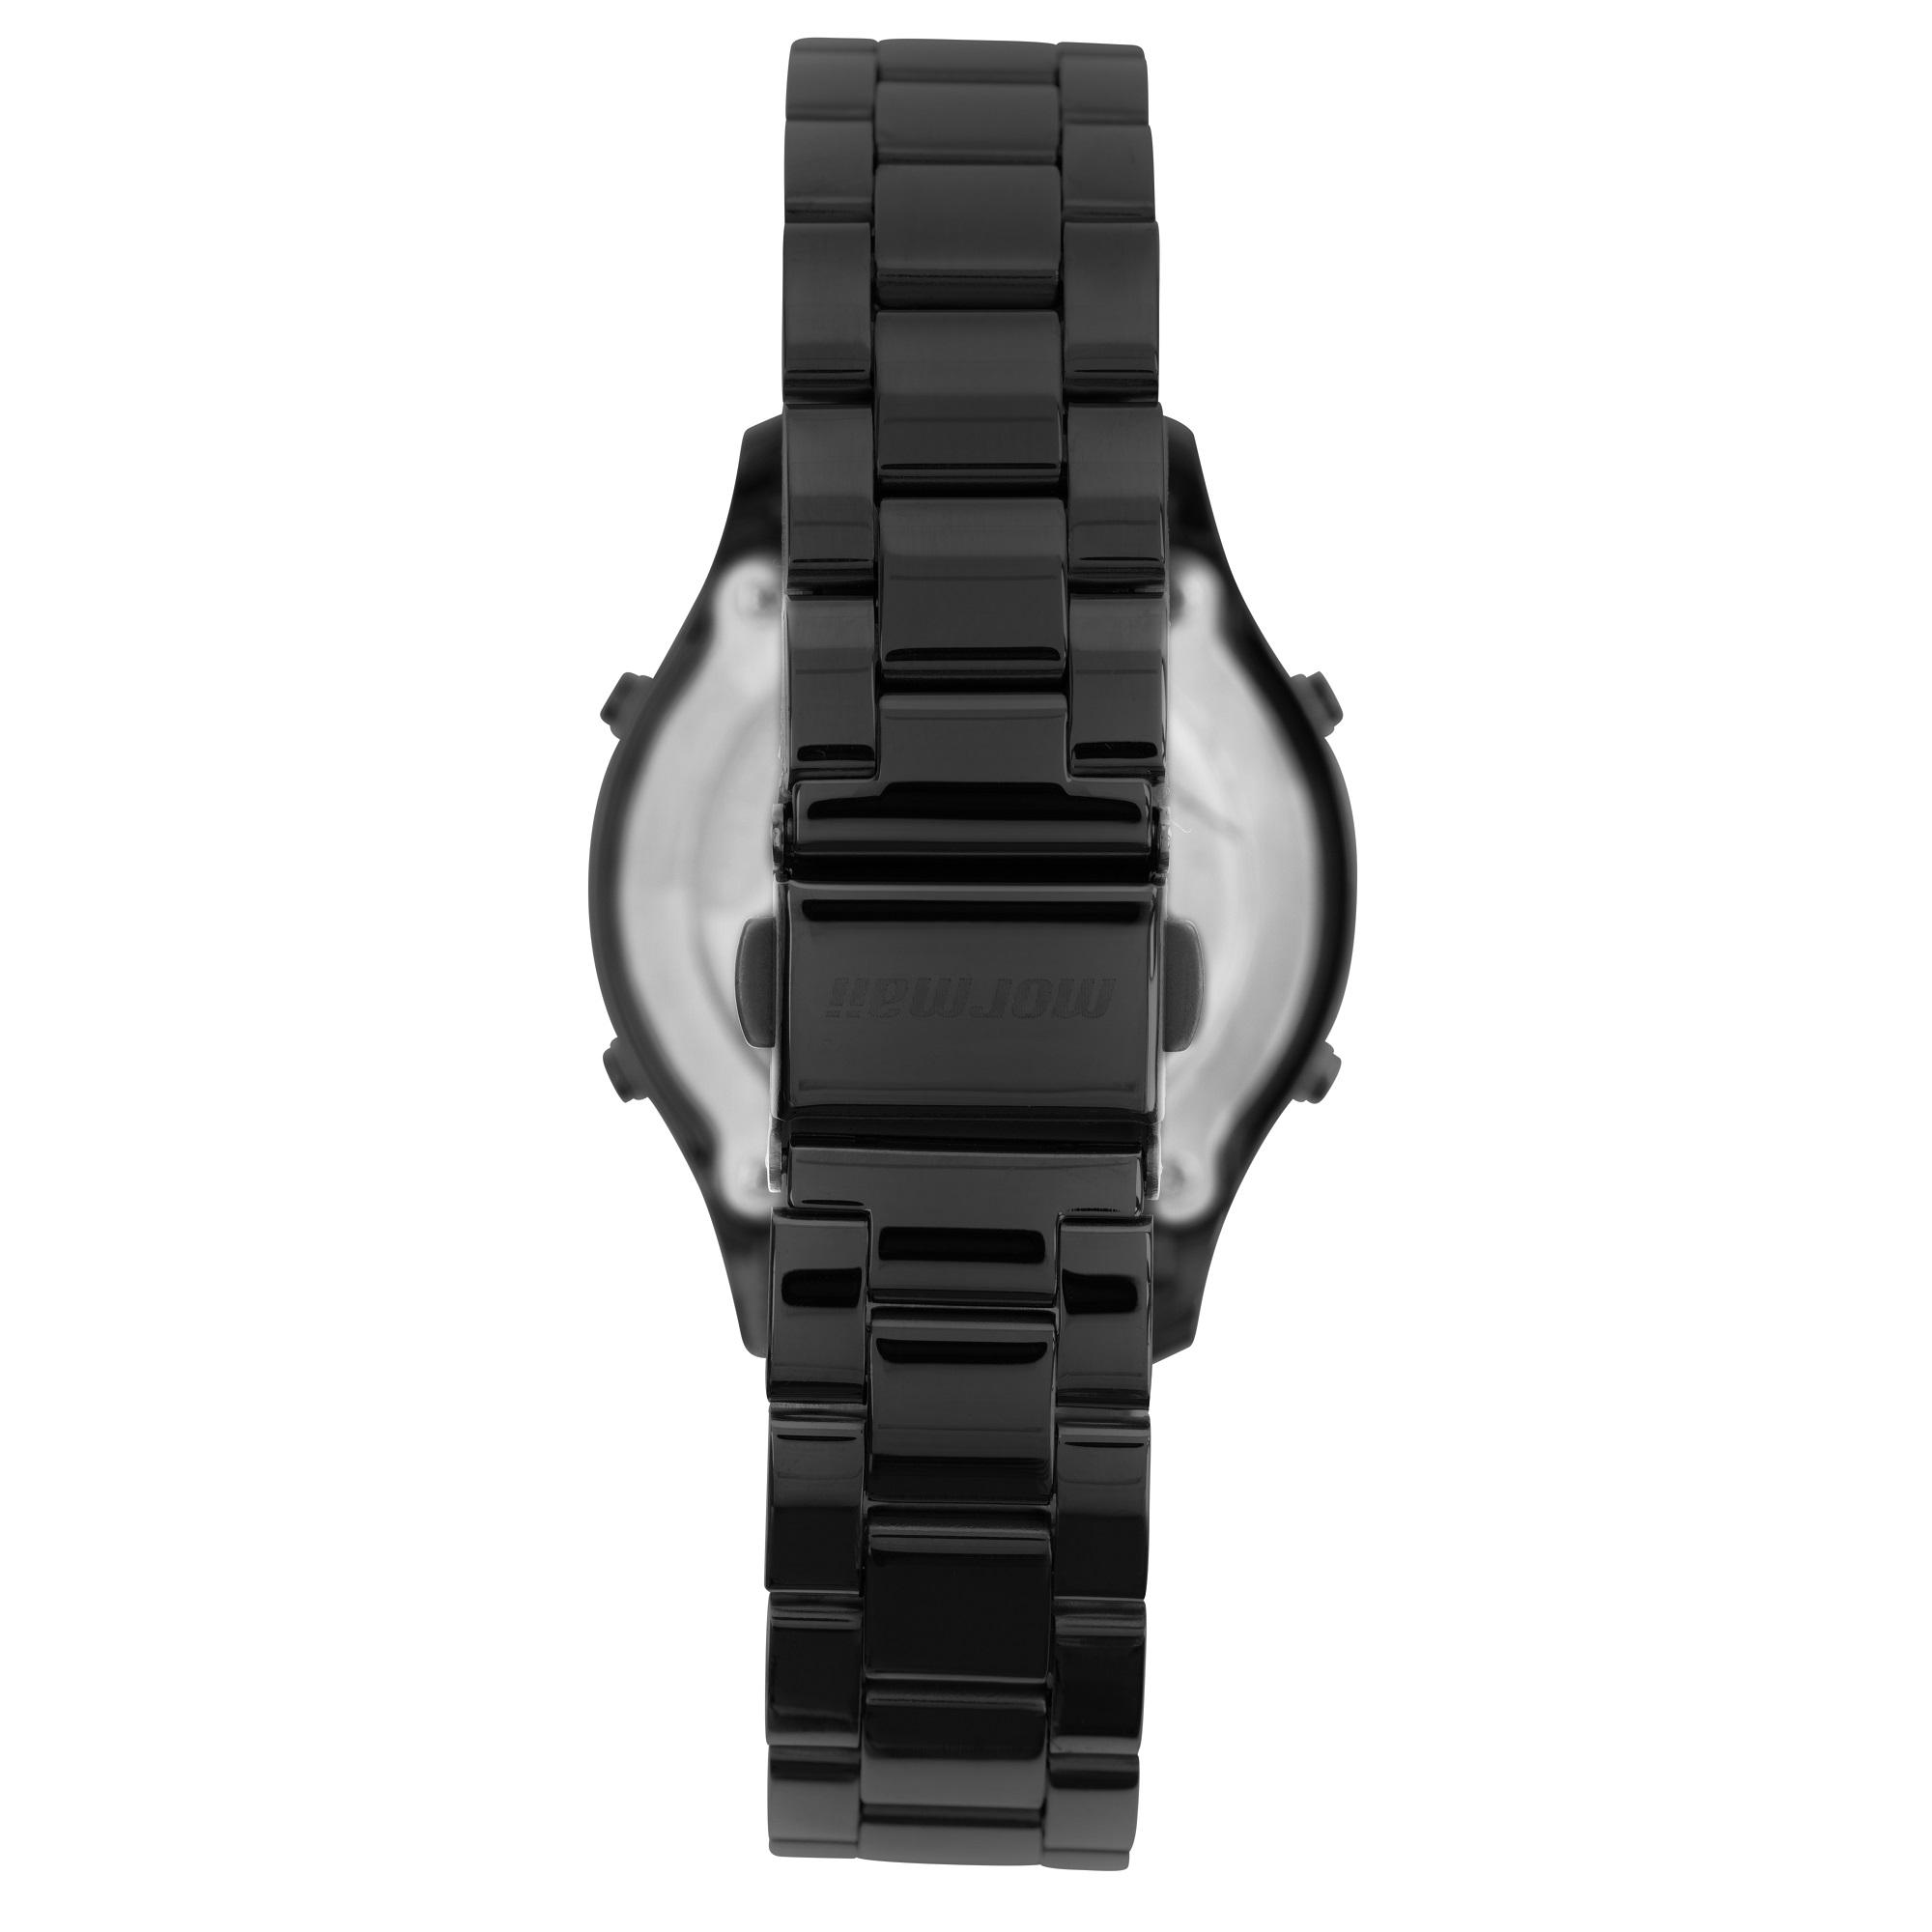 Relógio Feminino Mormaii MO4219AE/7P 37mm Aço Preto